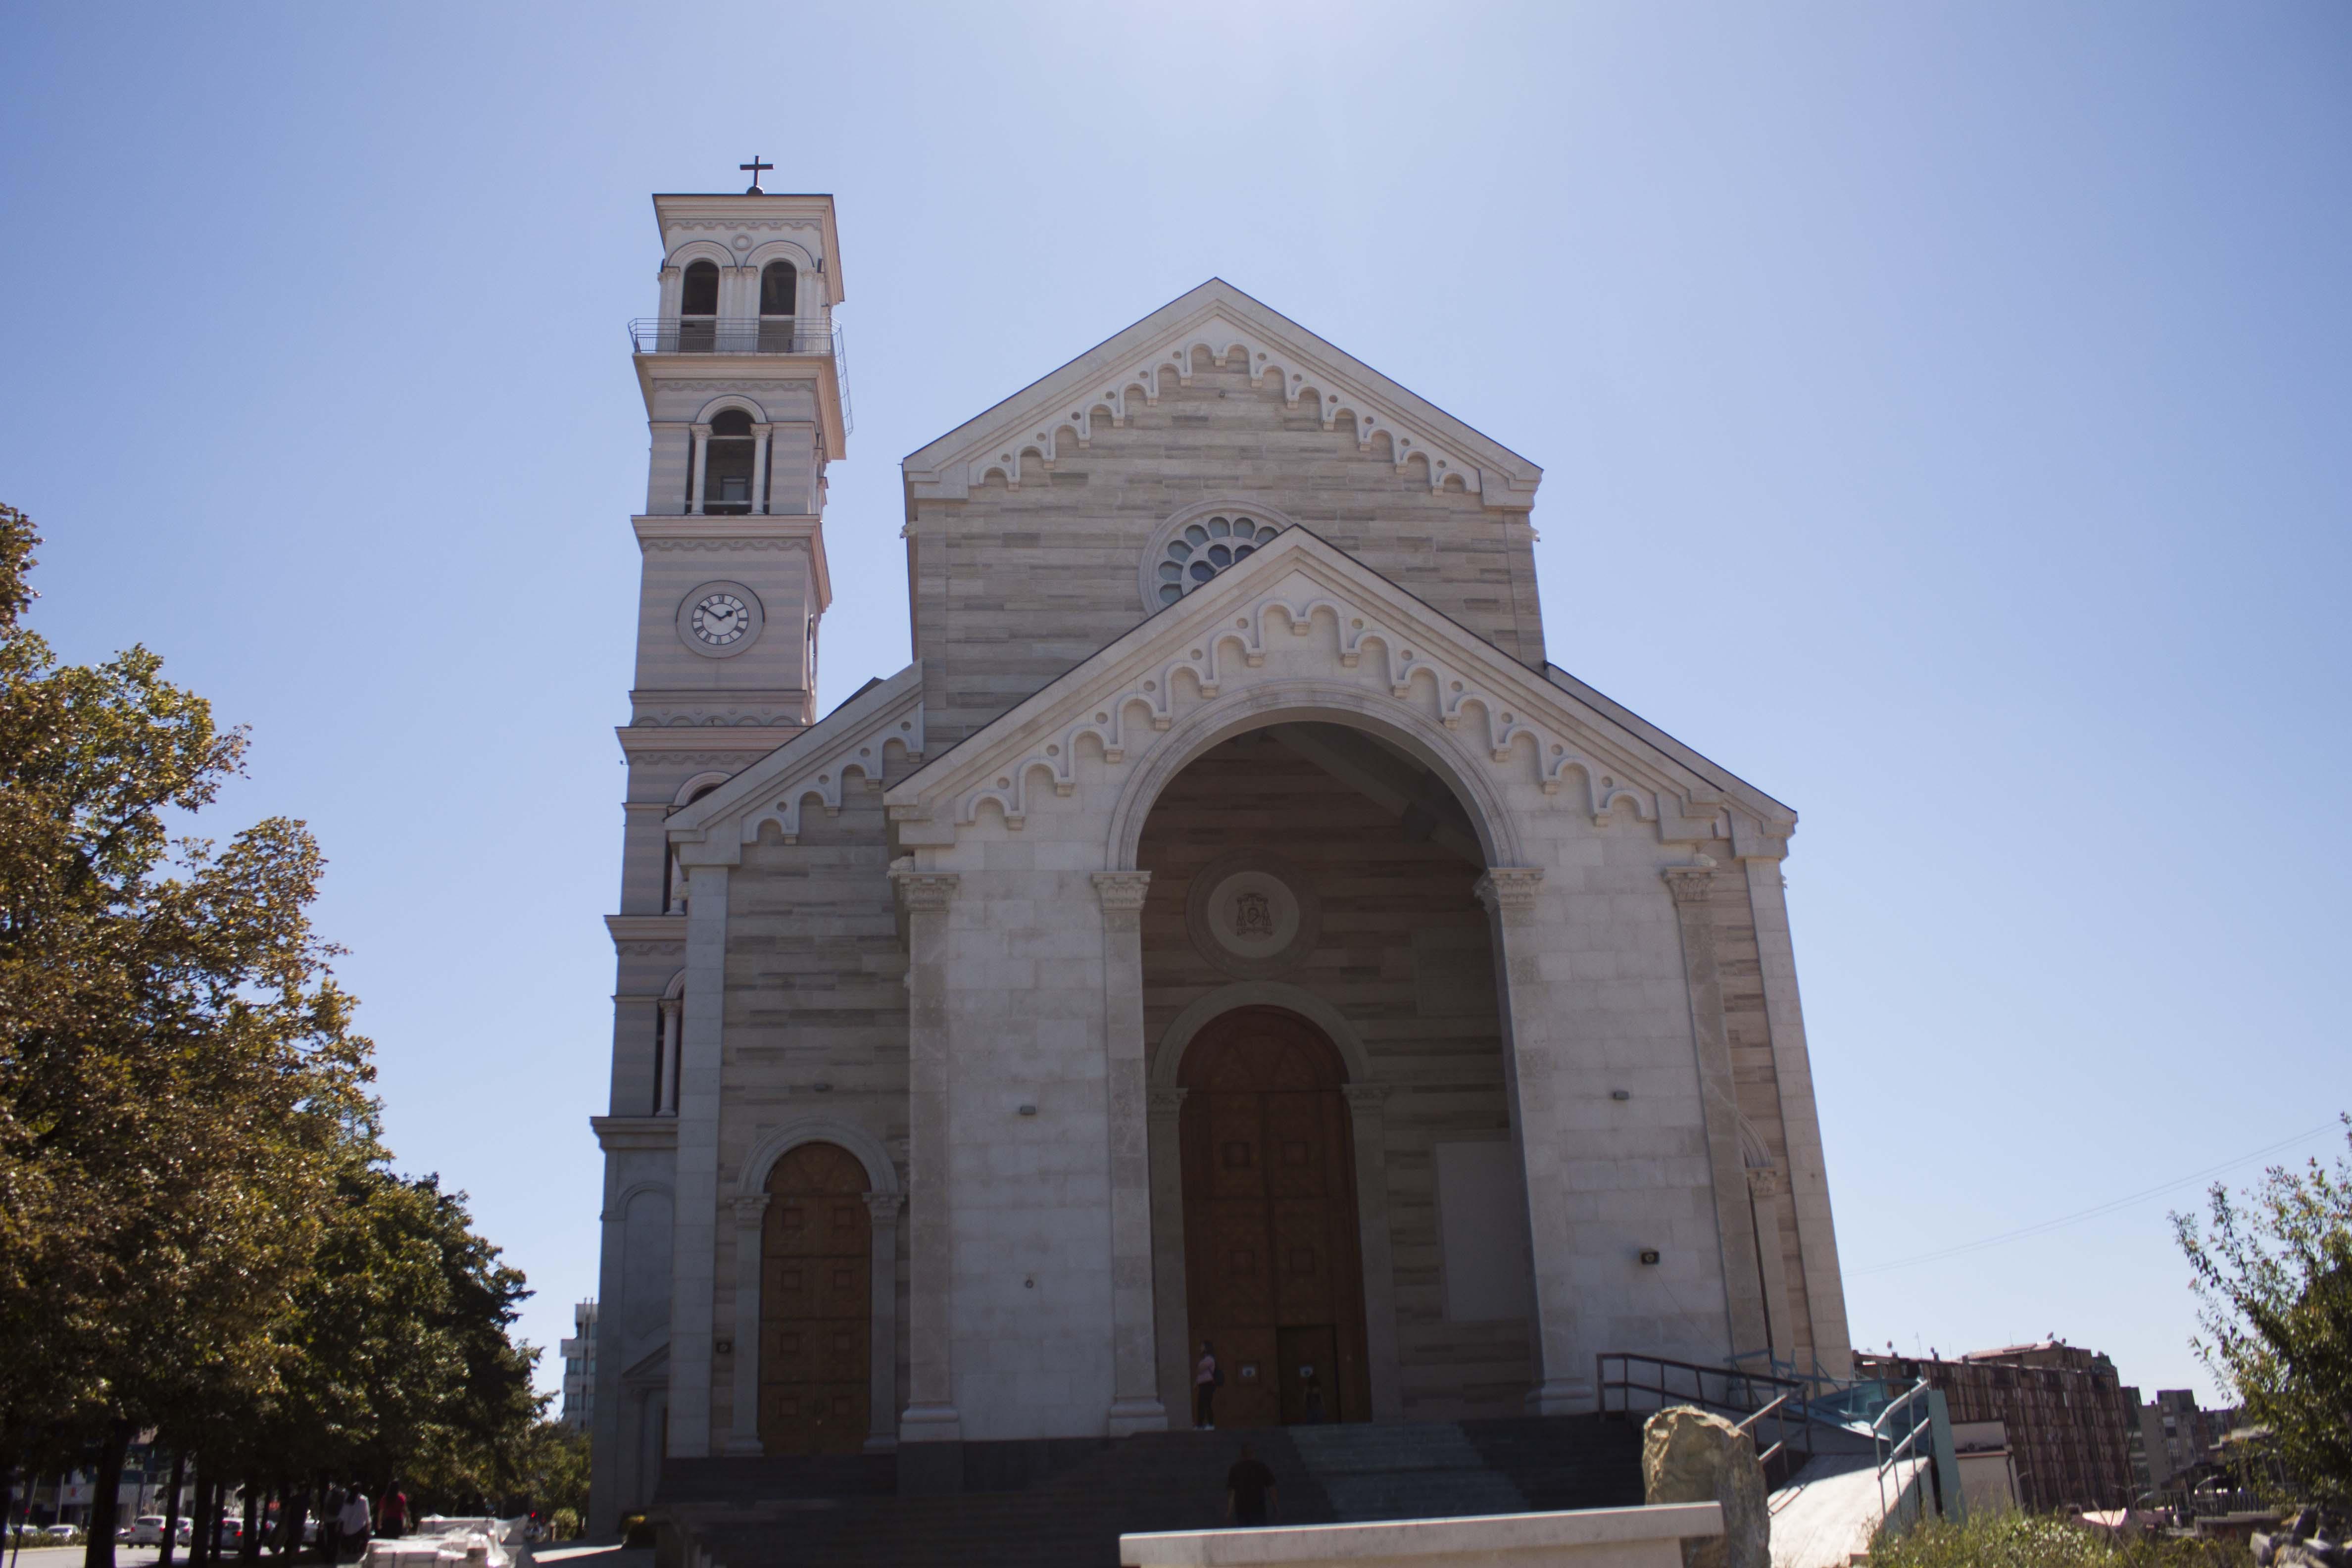 Katedrala svete majke Tereze